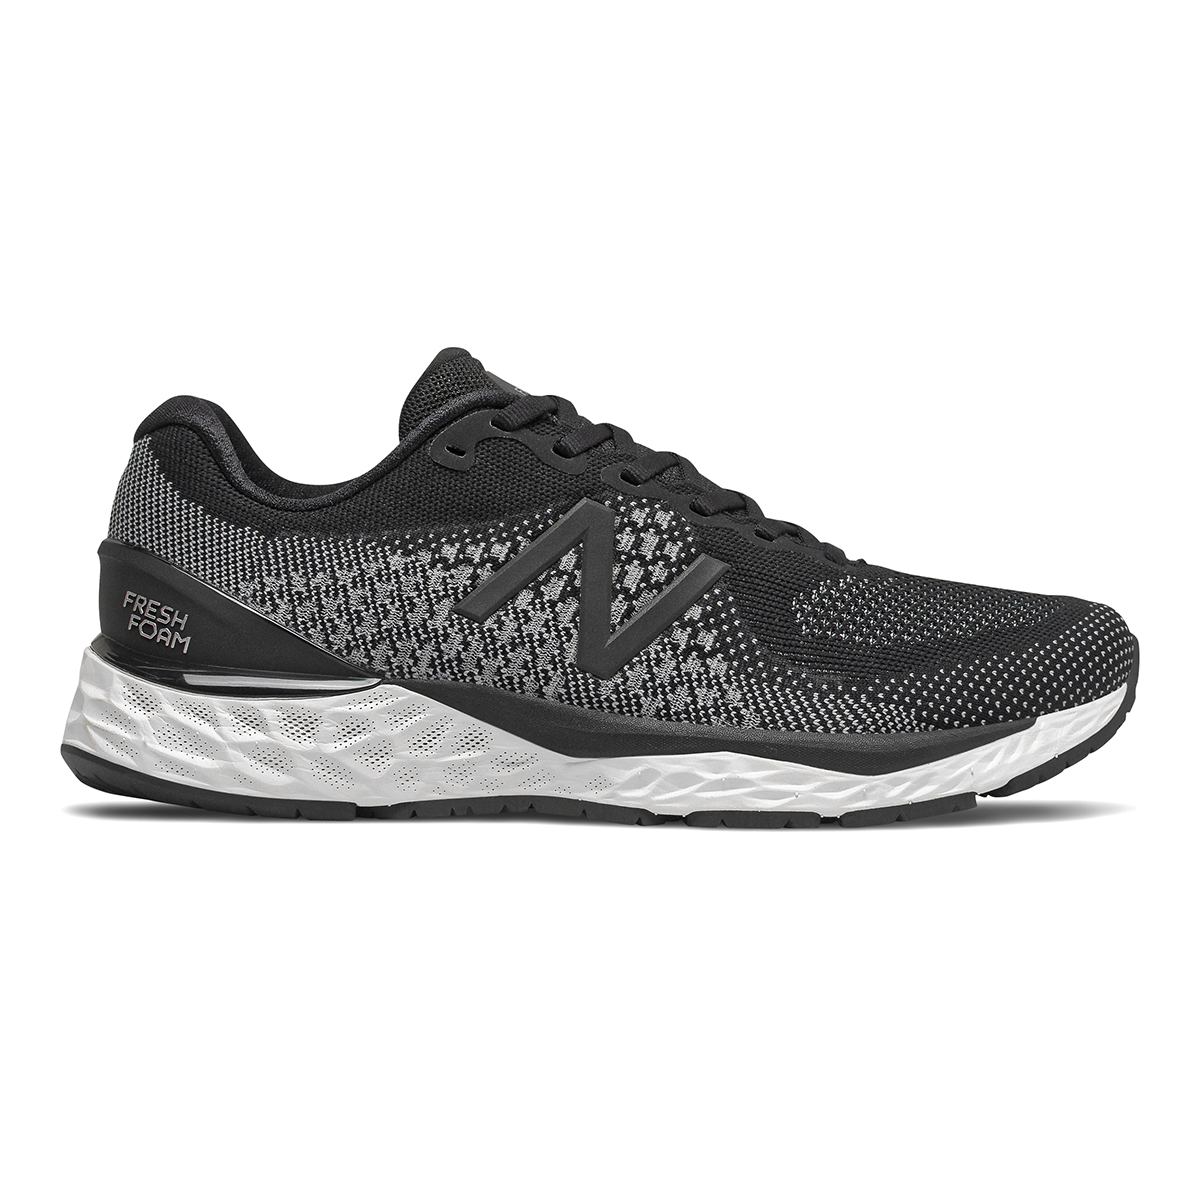 Men's New Balance 880v10 Running Shoe - Color: Black / White   (Regular Width) - Size: 10.5, Black / White, large, image 1